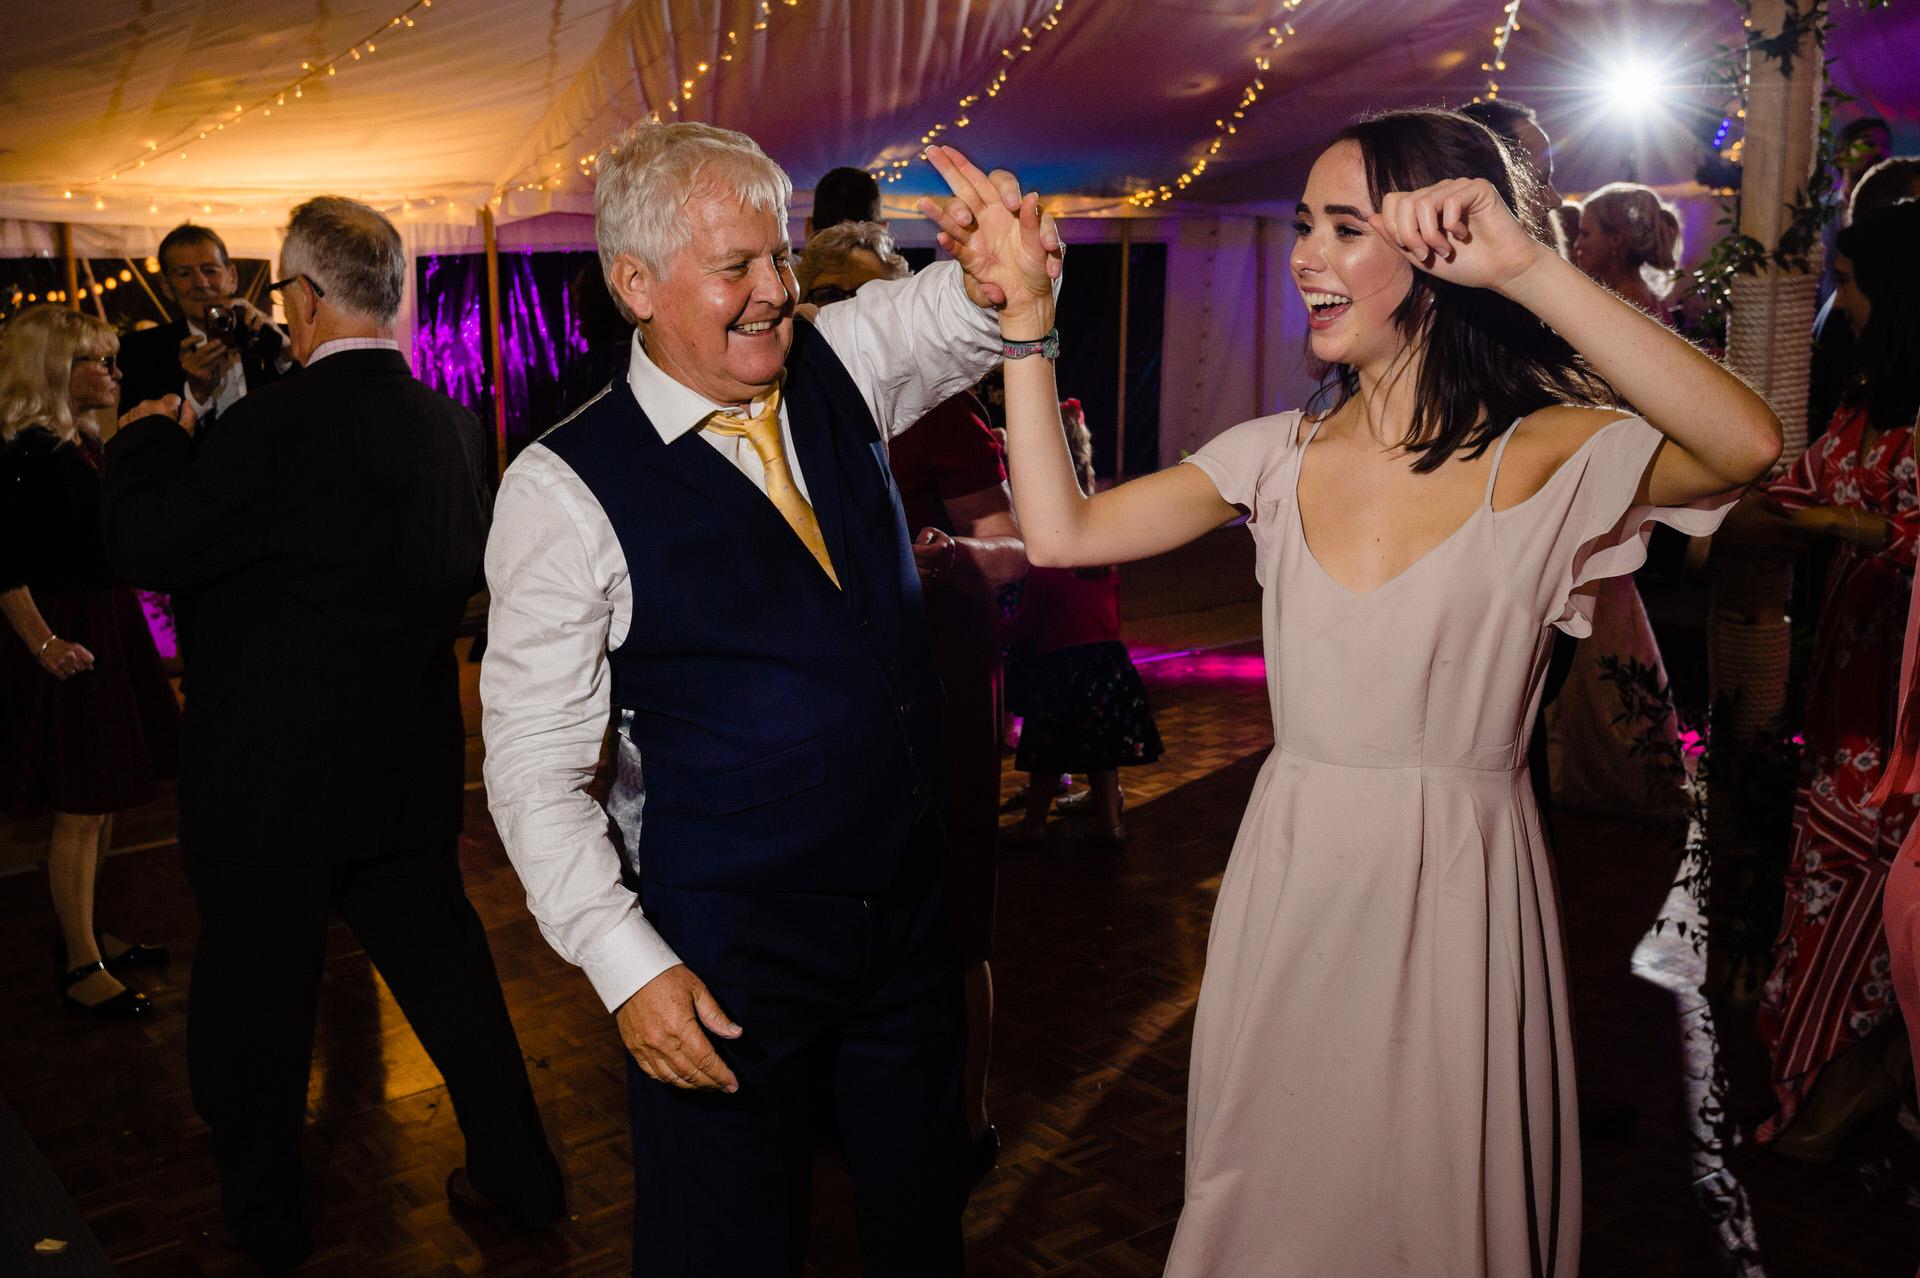 Bignor park dancing at wedding